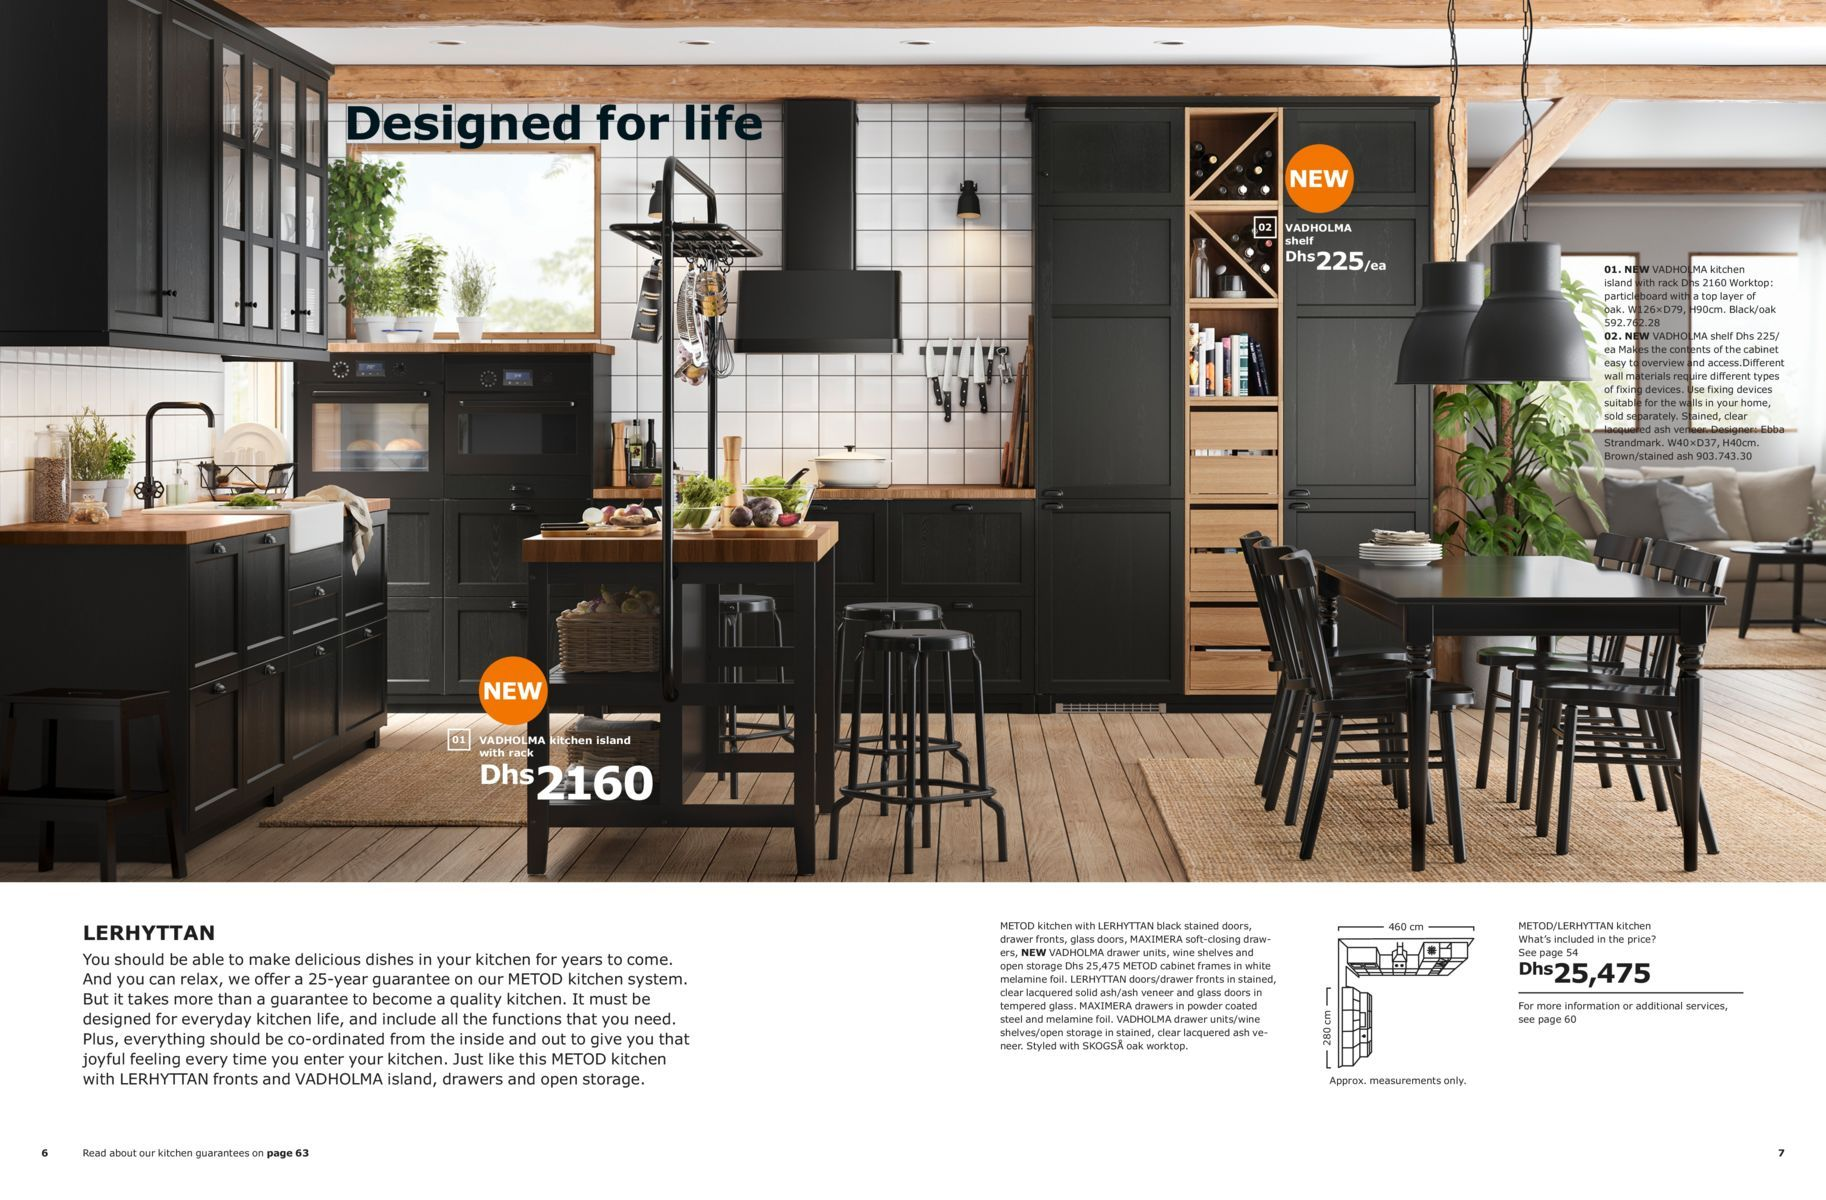 Designed For Life Ikea Kitchens Brochure 2019 Cuisine Ikea Ikea Kitchen Kitchen World